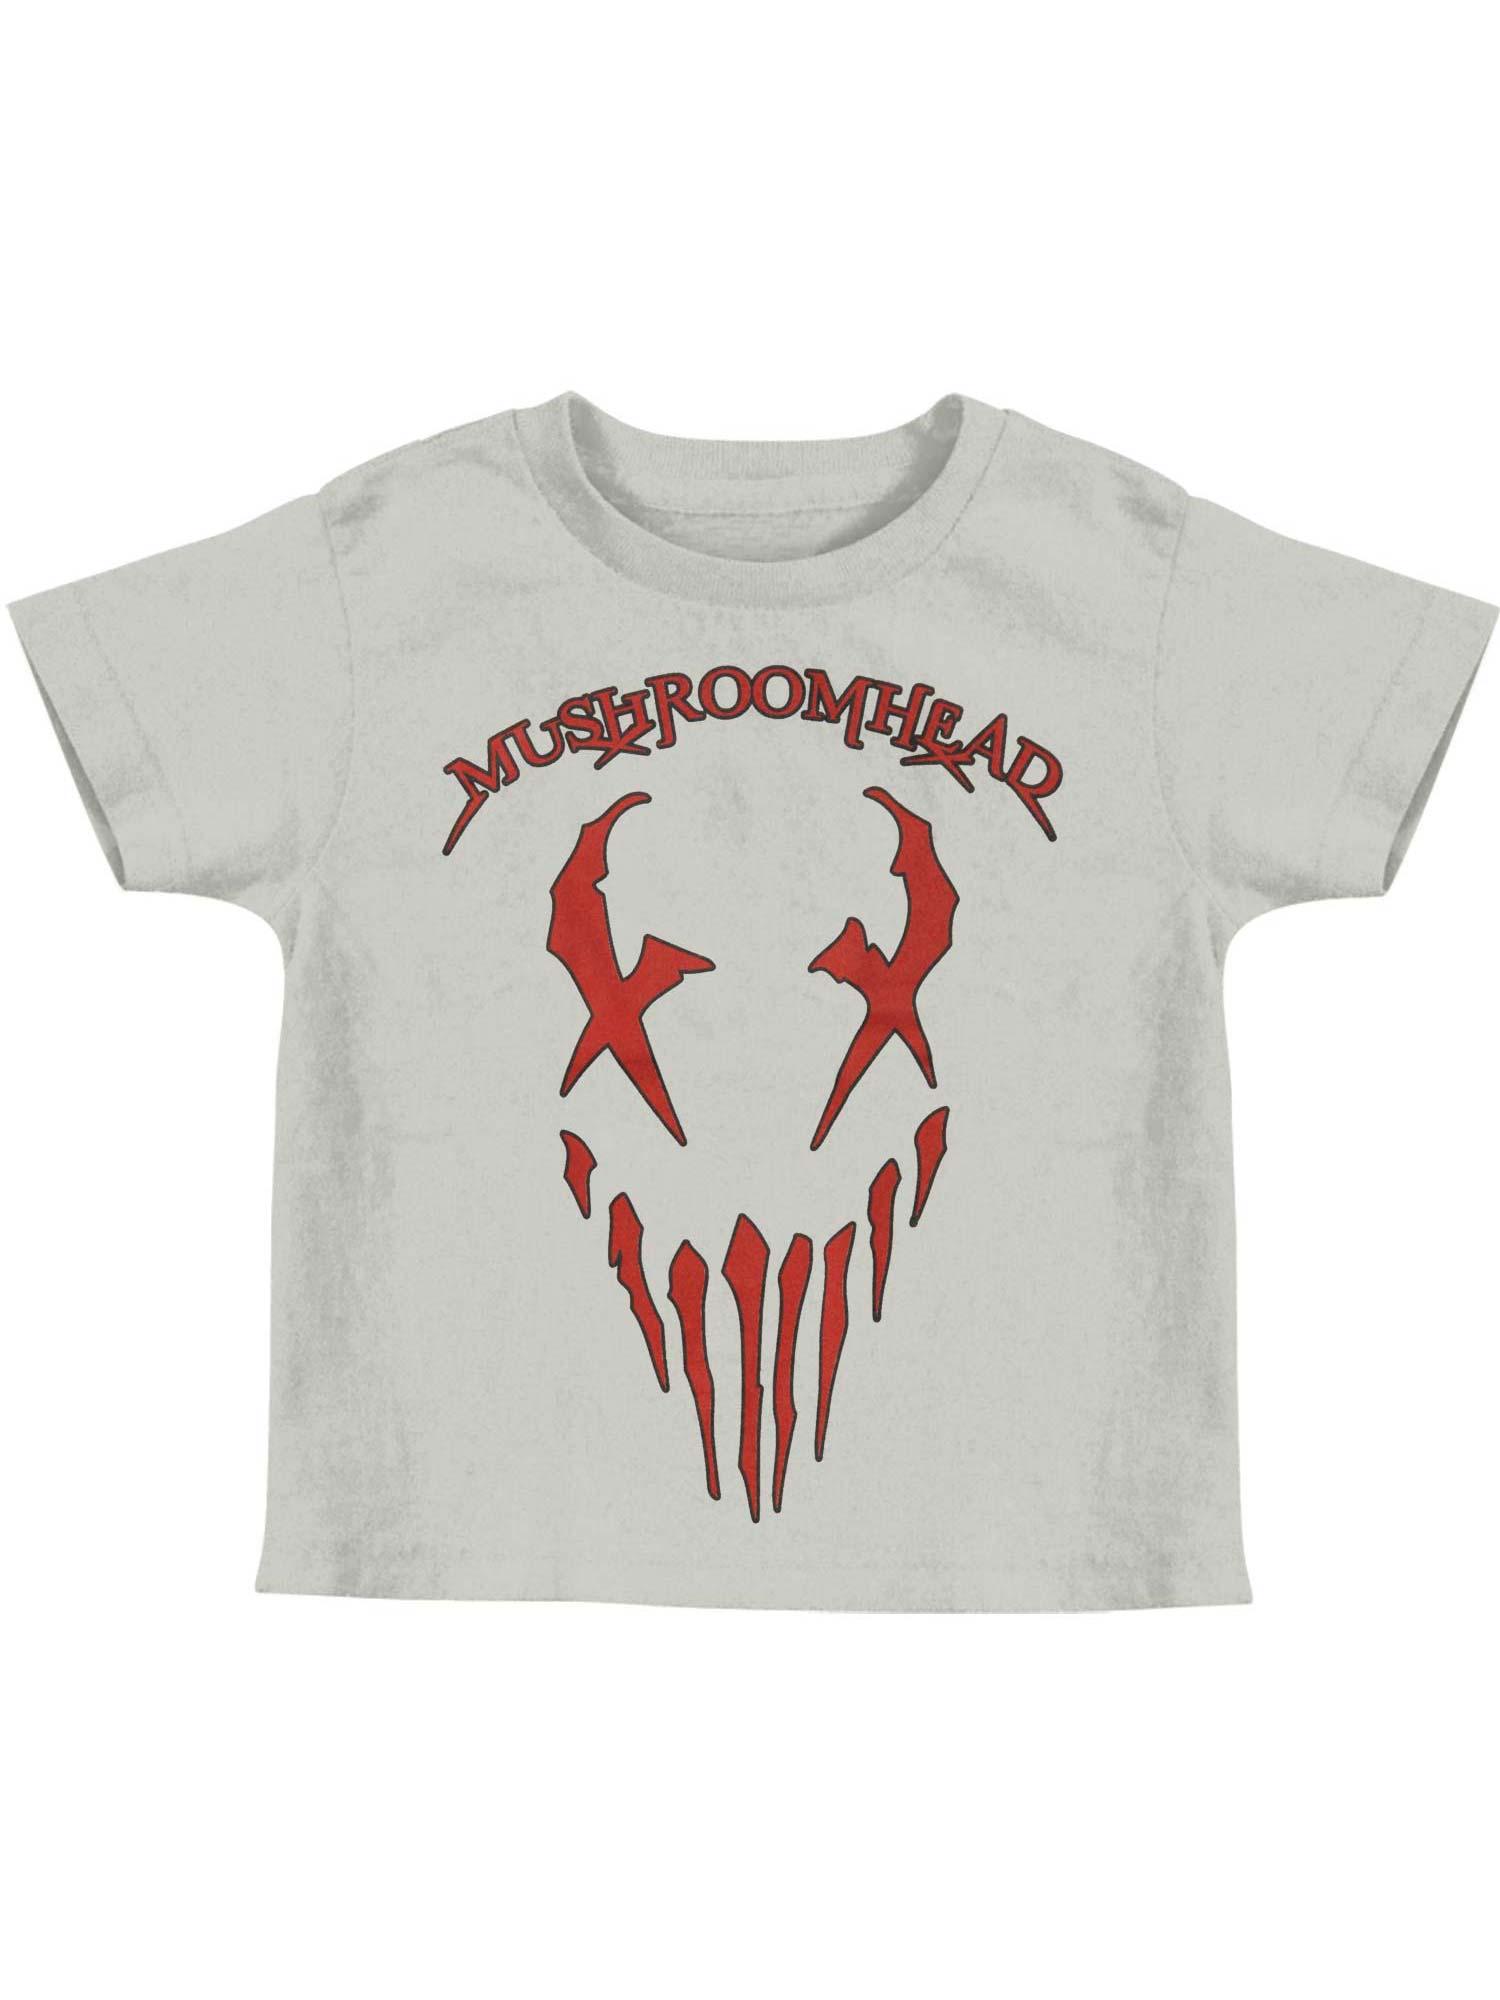 Mushroomhead Boys' X Face Childrens T-shirt Silver